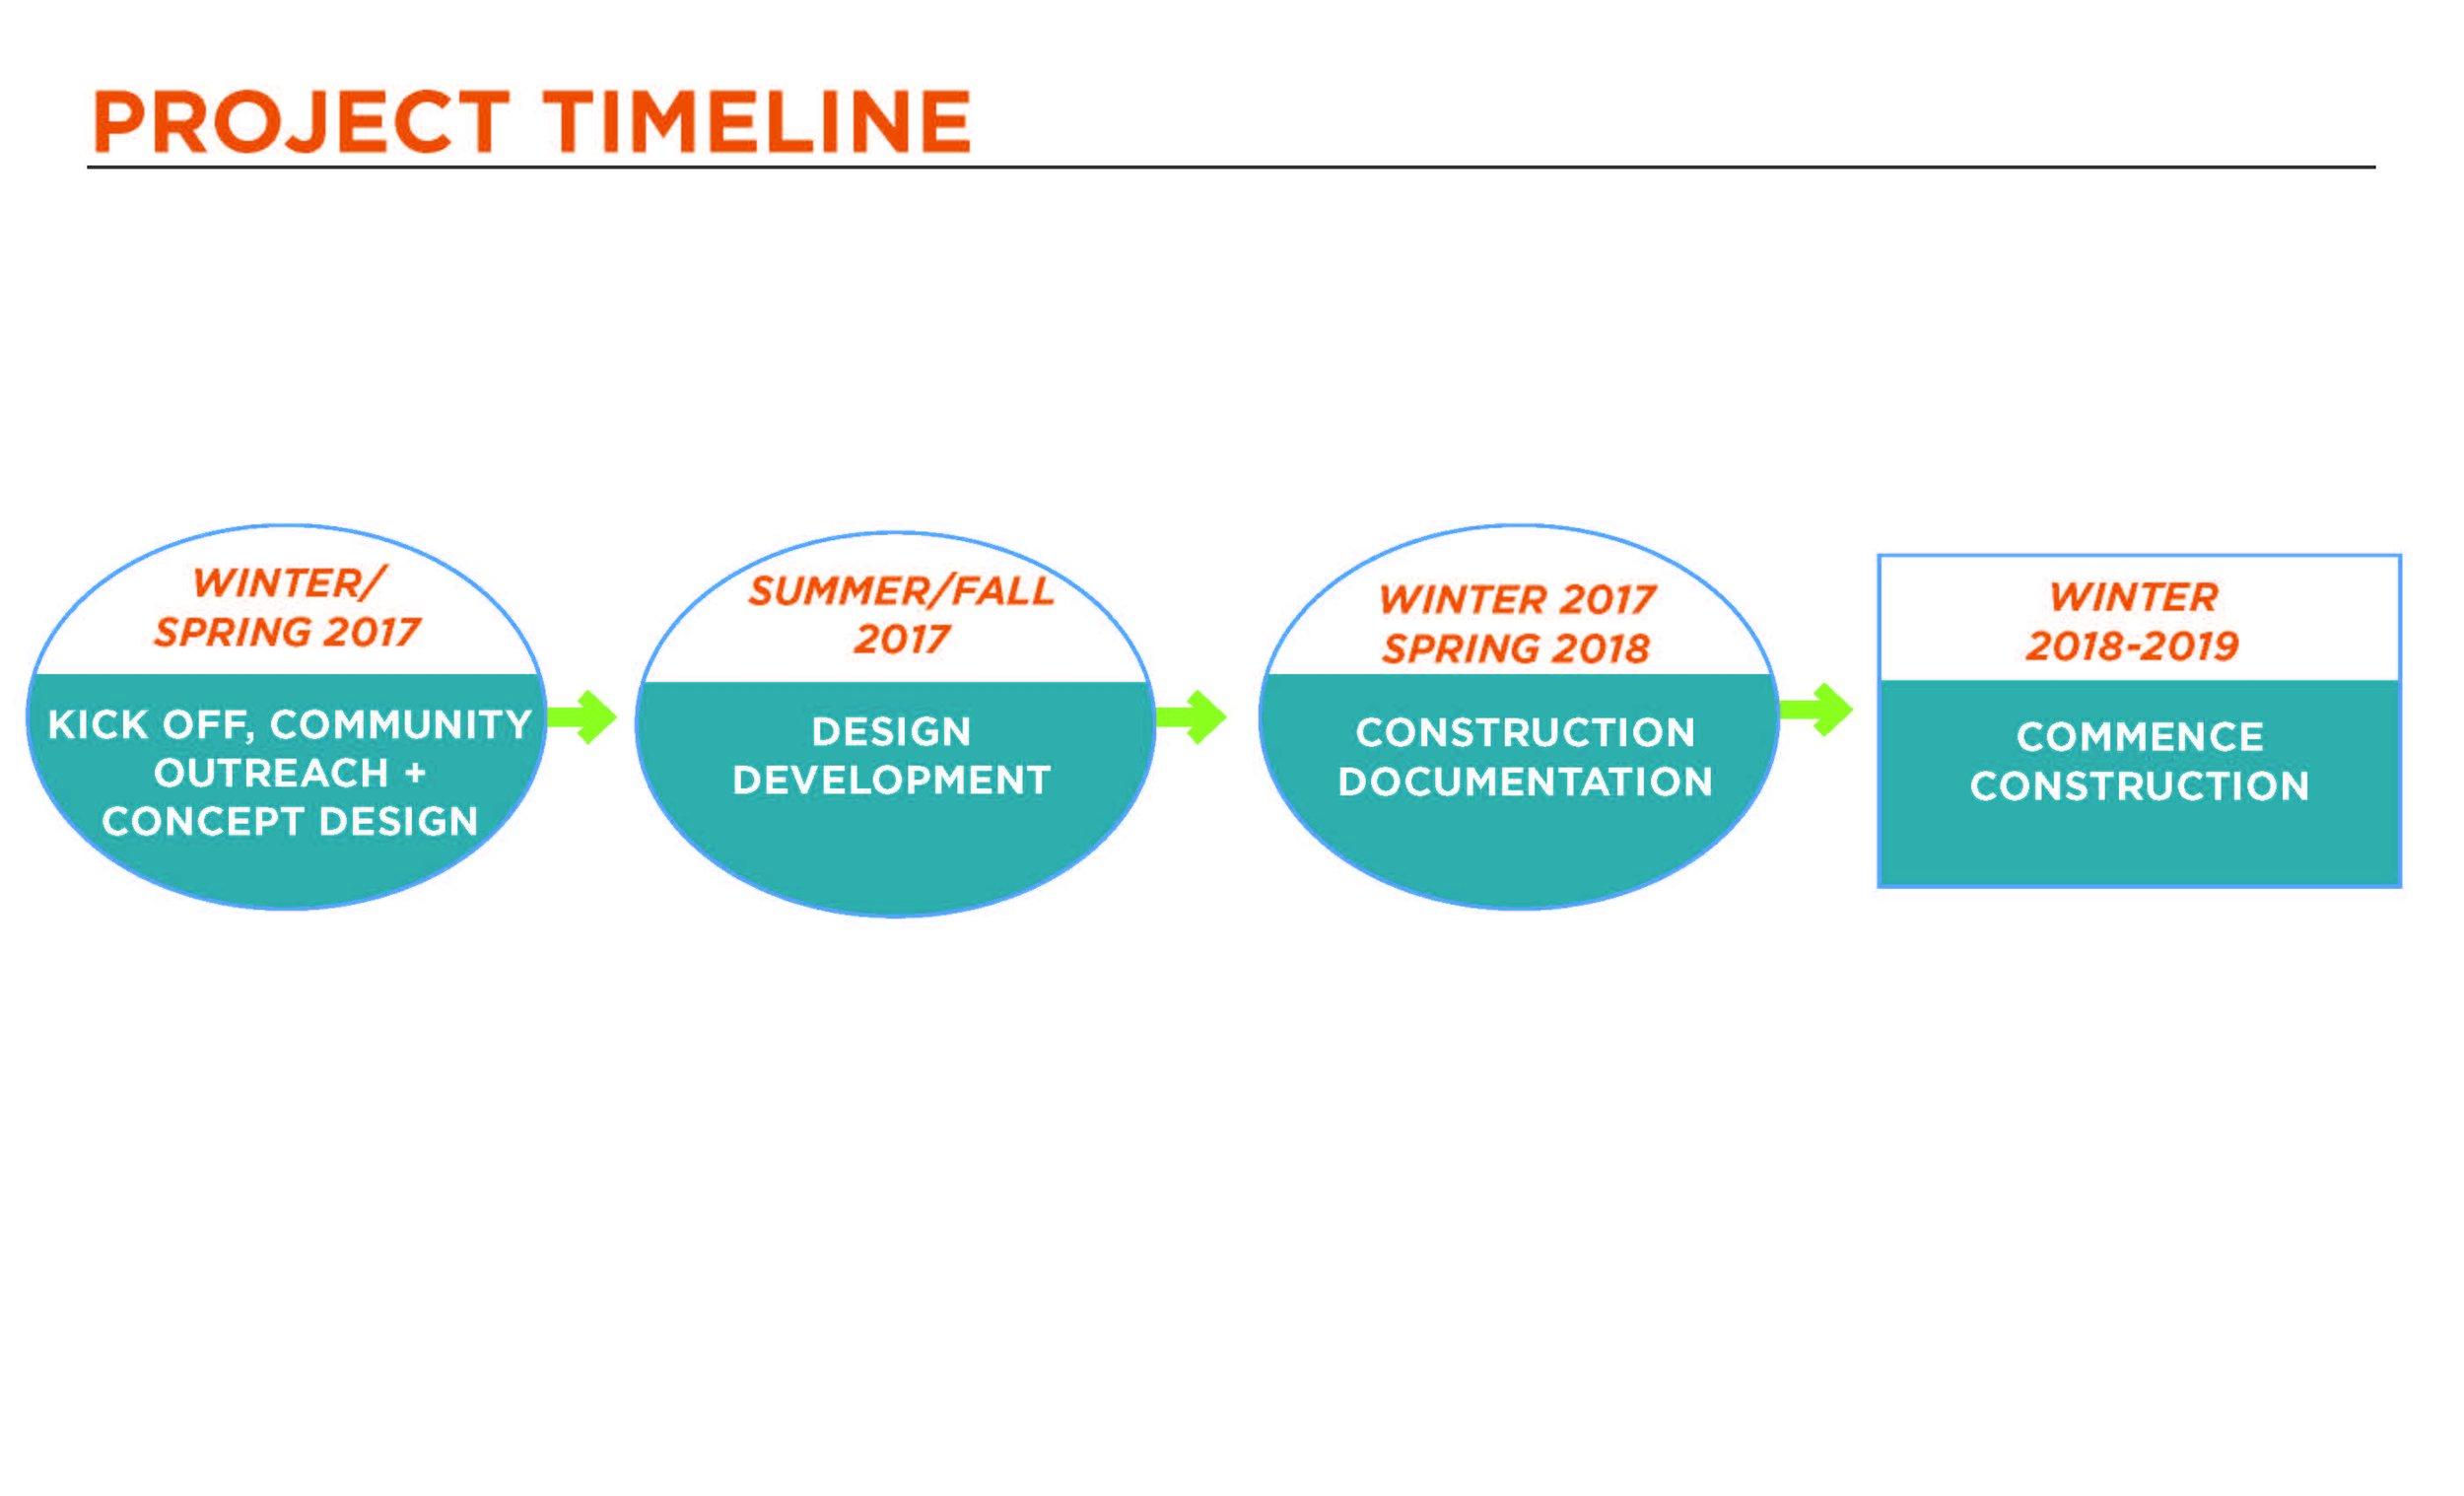 180326_NBT_Final Design presentation_Page_03.jpg